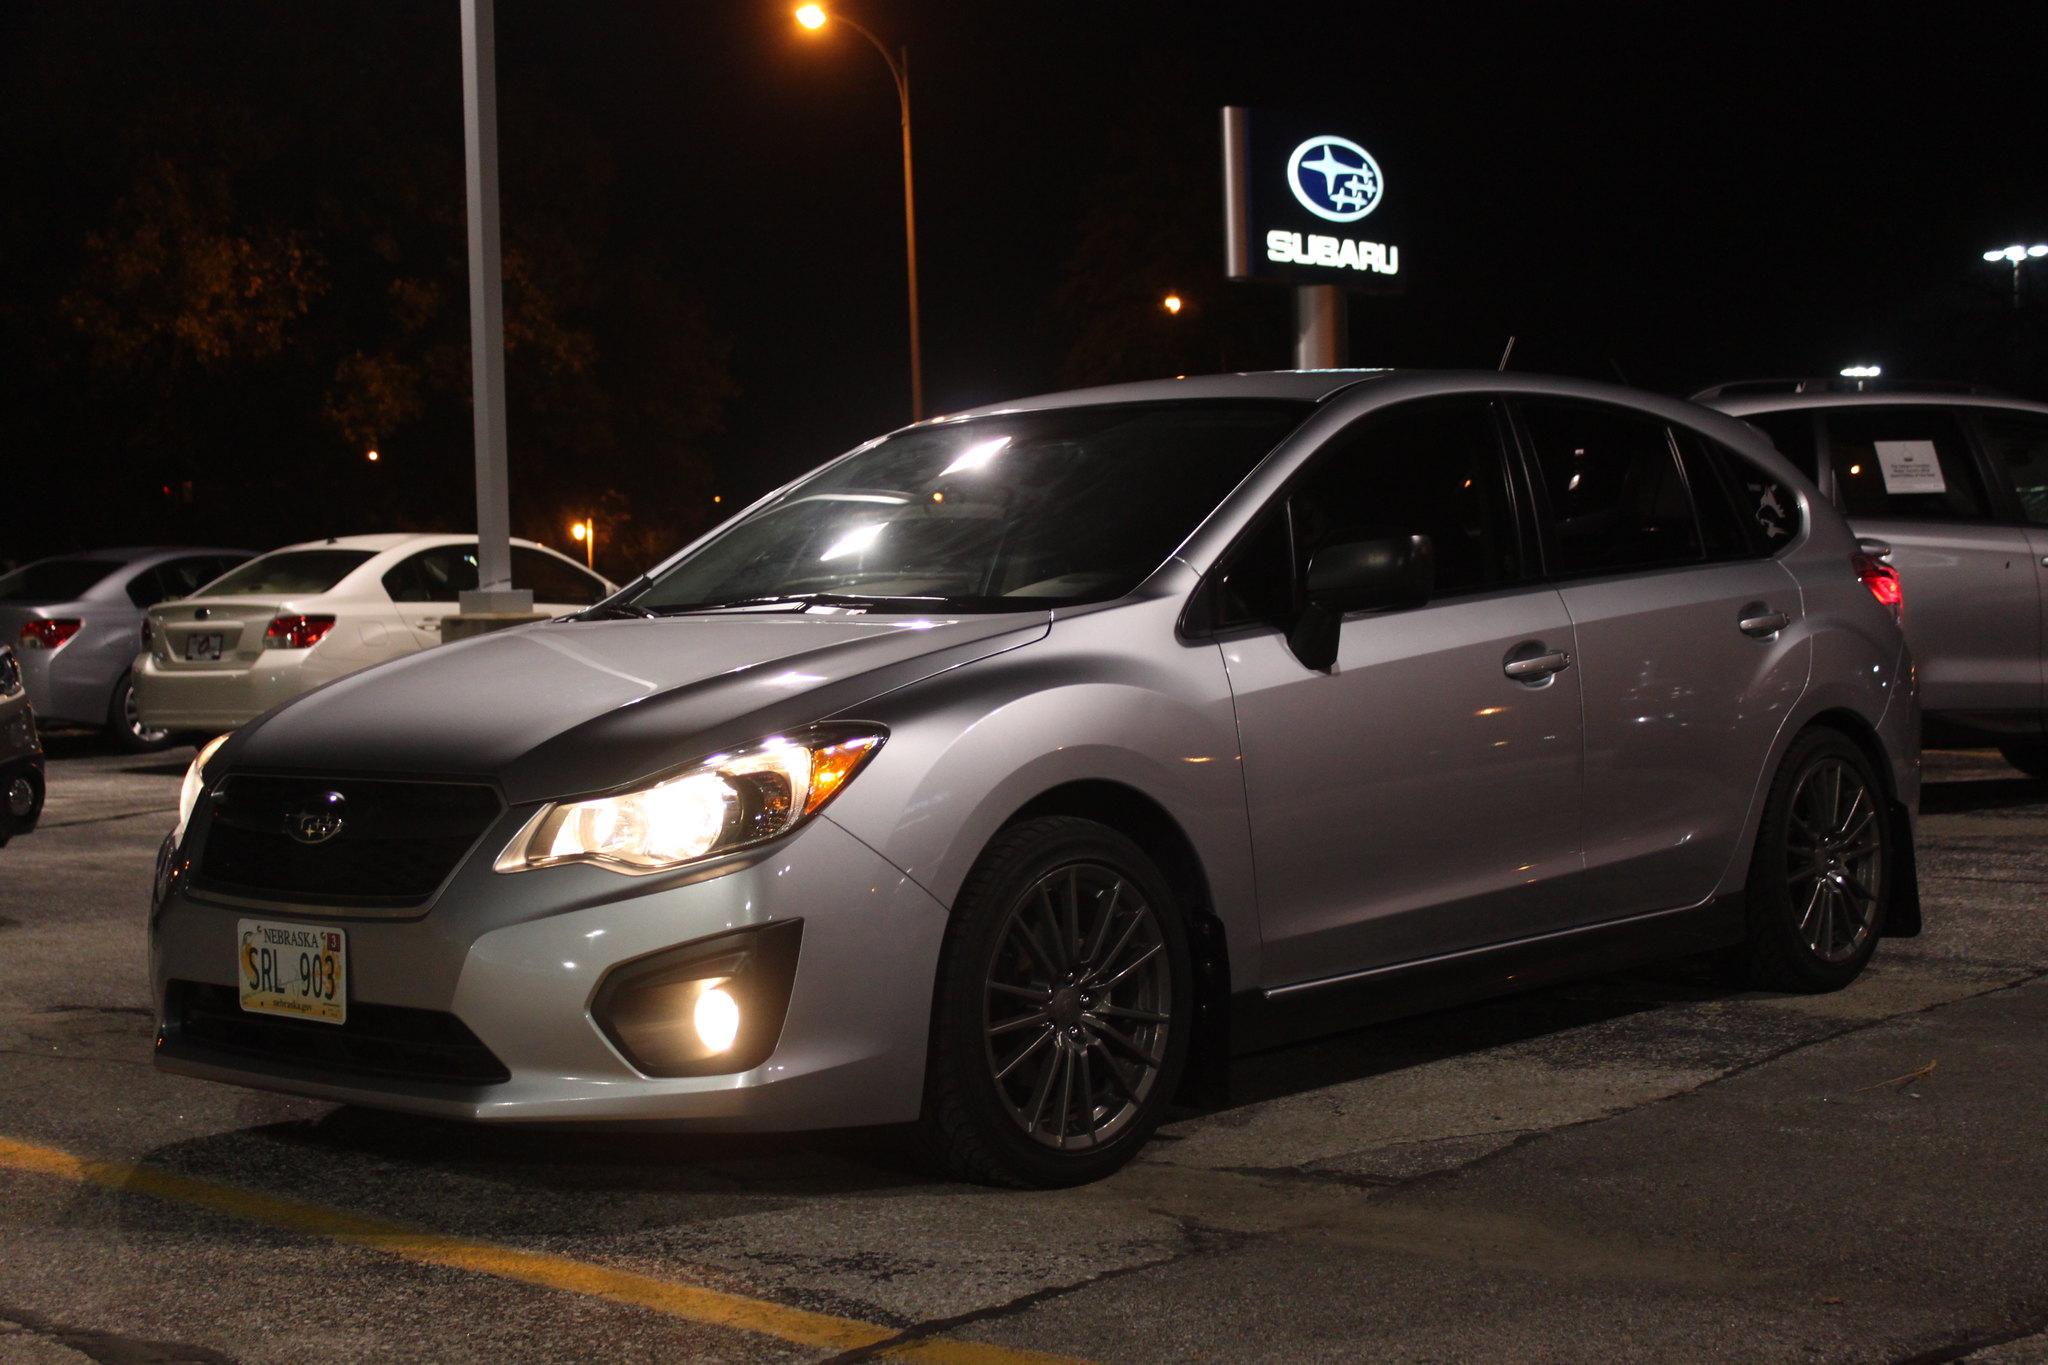 All Well Drive Hybrid Tail Lights On My 12 Impreza Hatchback 2012 Subaru Wiring Harness